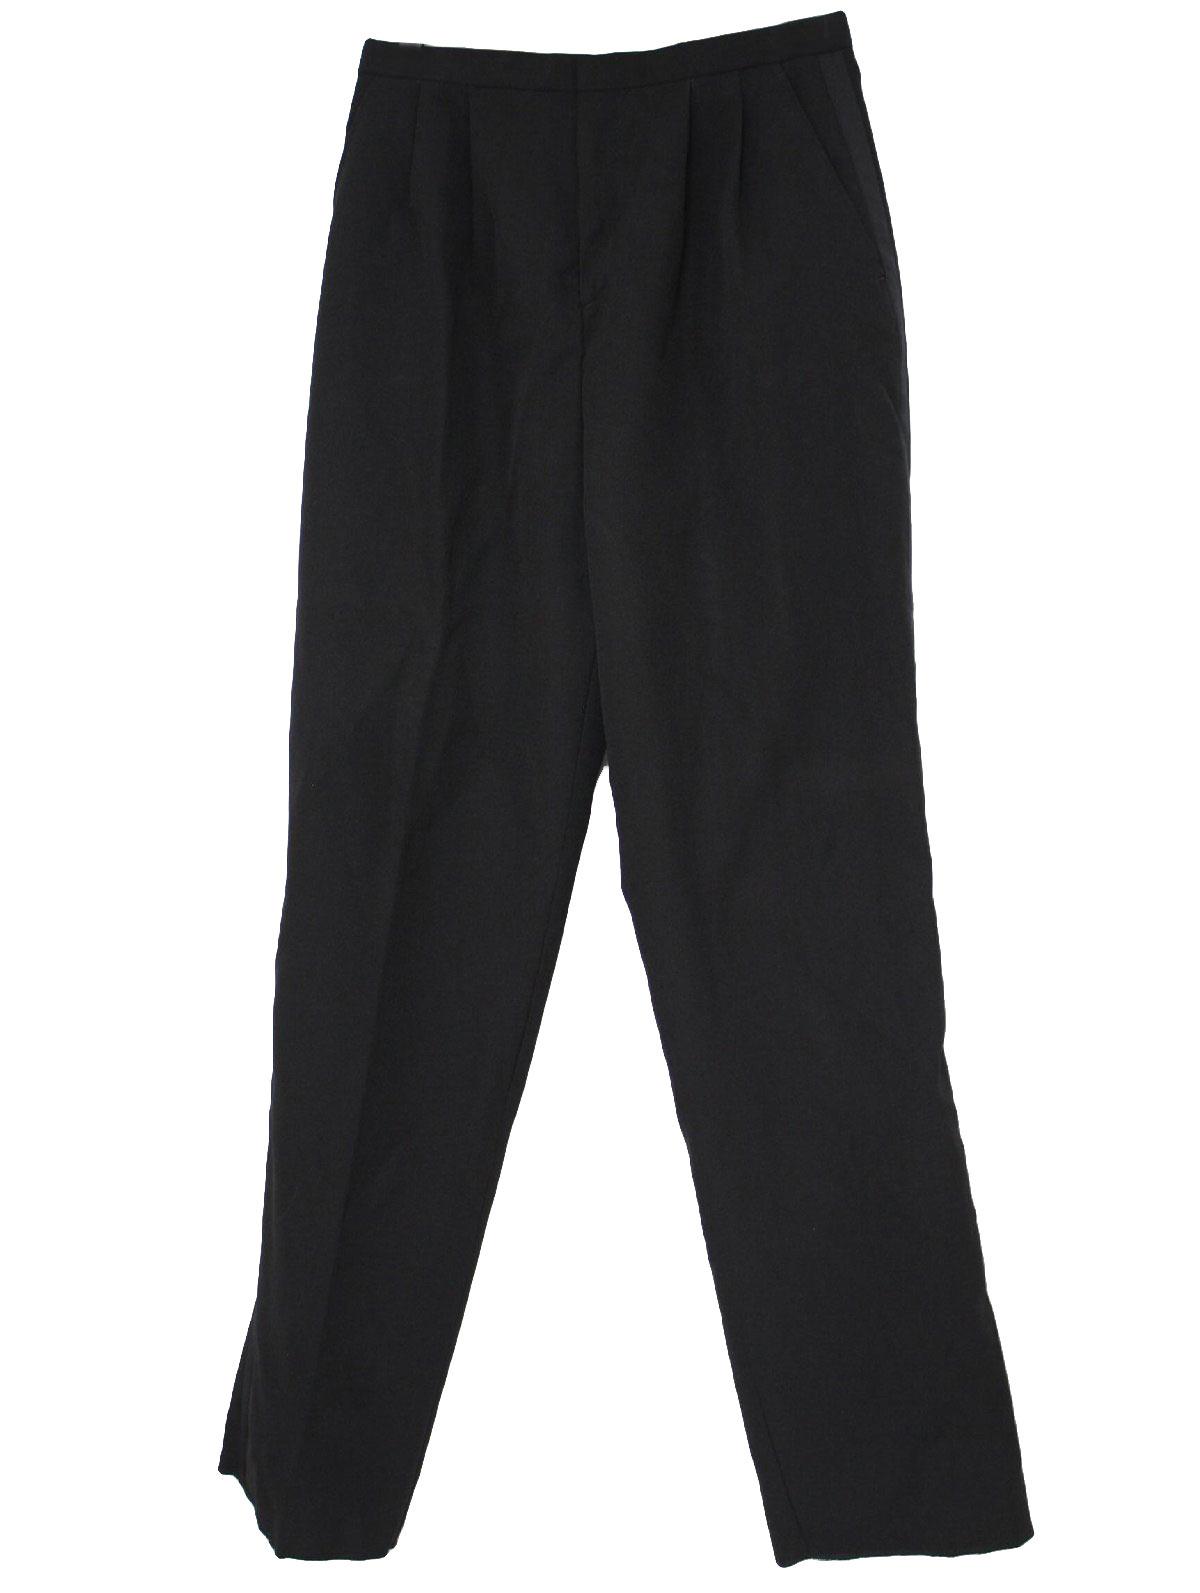 Elegant Eighties Vintage Pants 80s Mina Womens Black Polyester Tuxedo Pants